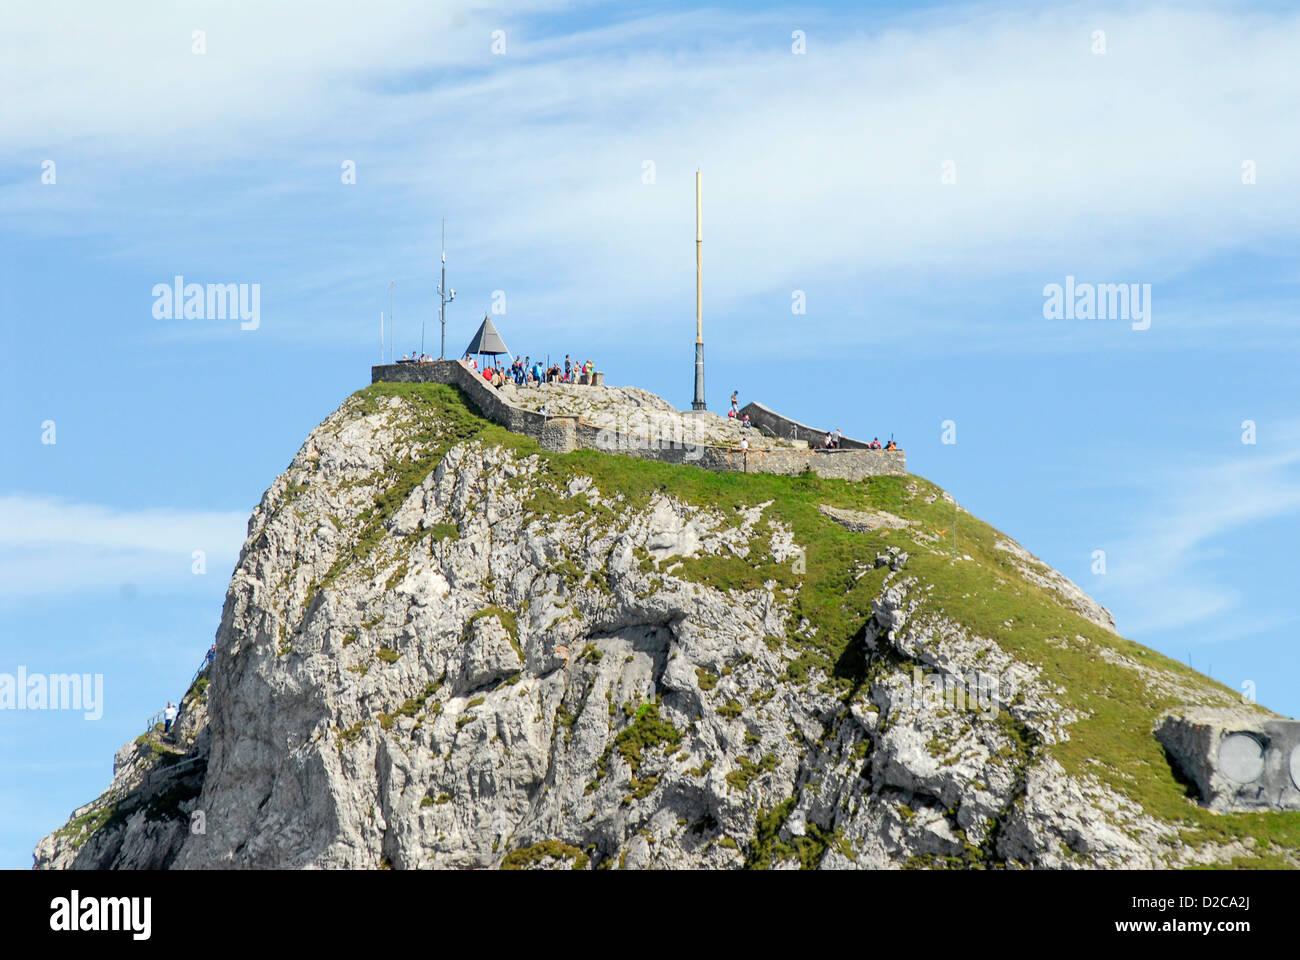 Mt. Pilatus, Switzerland - Stock Image